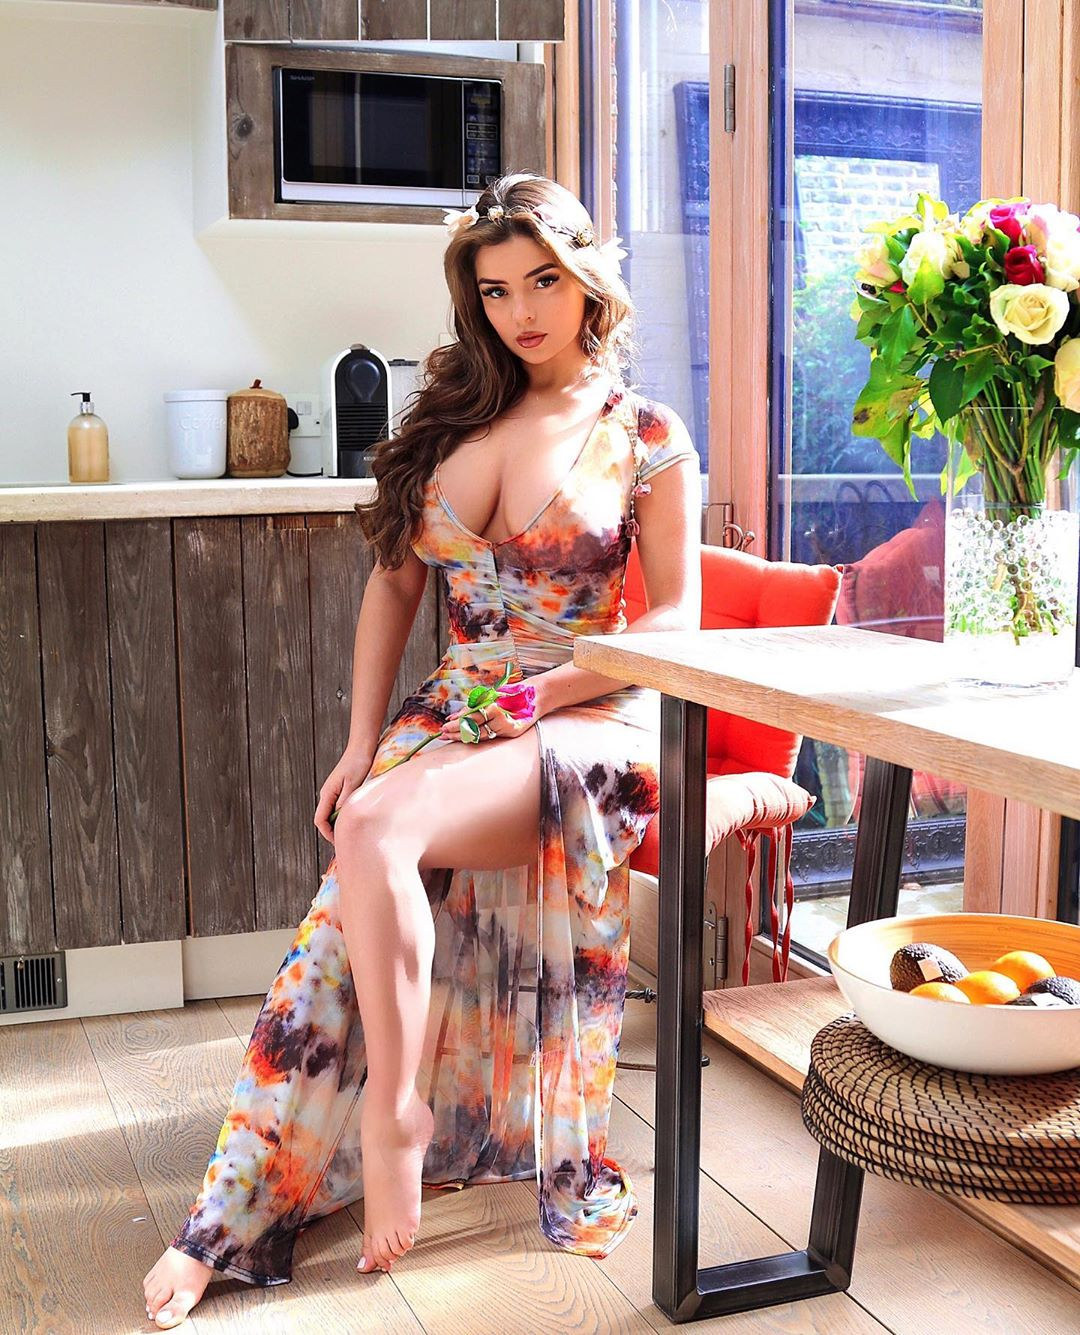 Demi Rose Mawby Beautiful In Sexy Dress